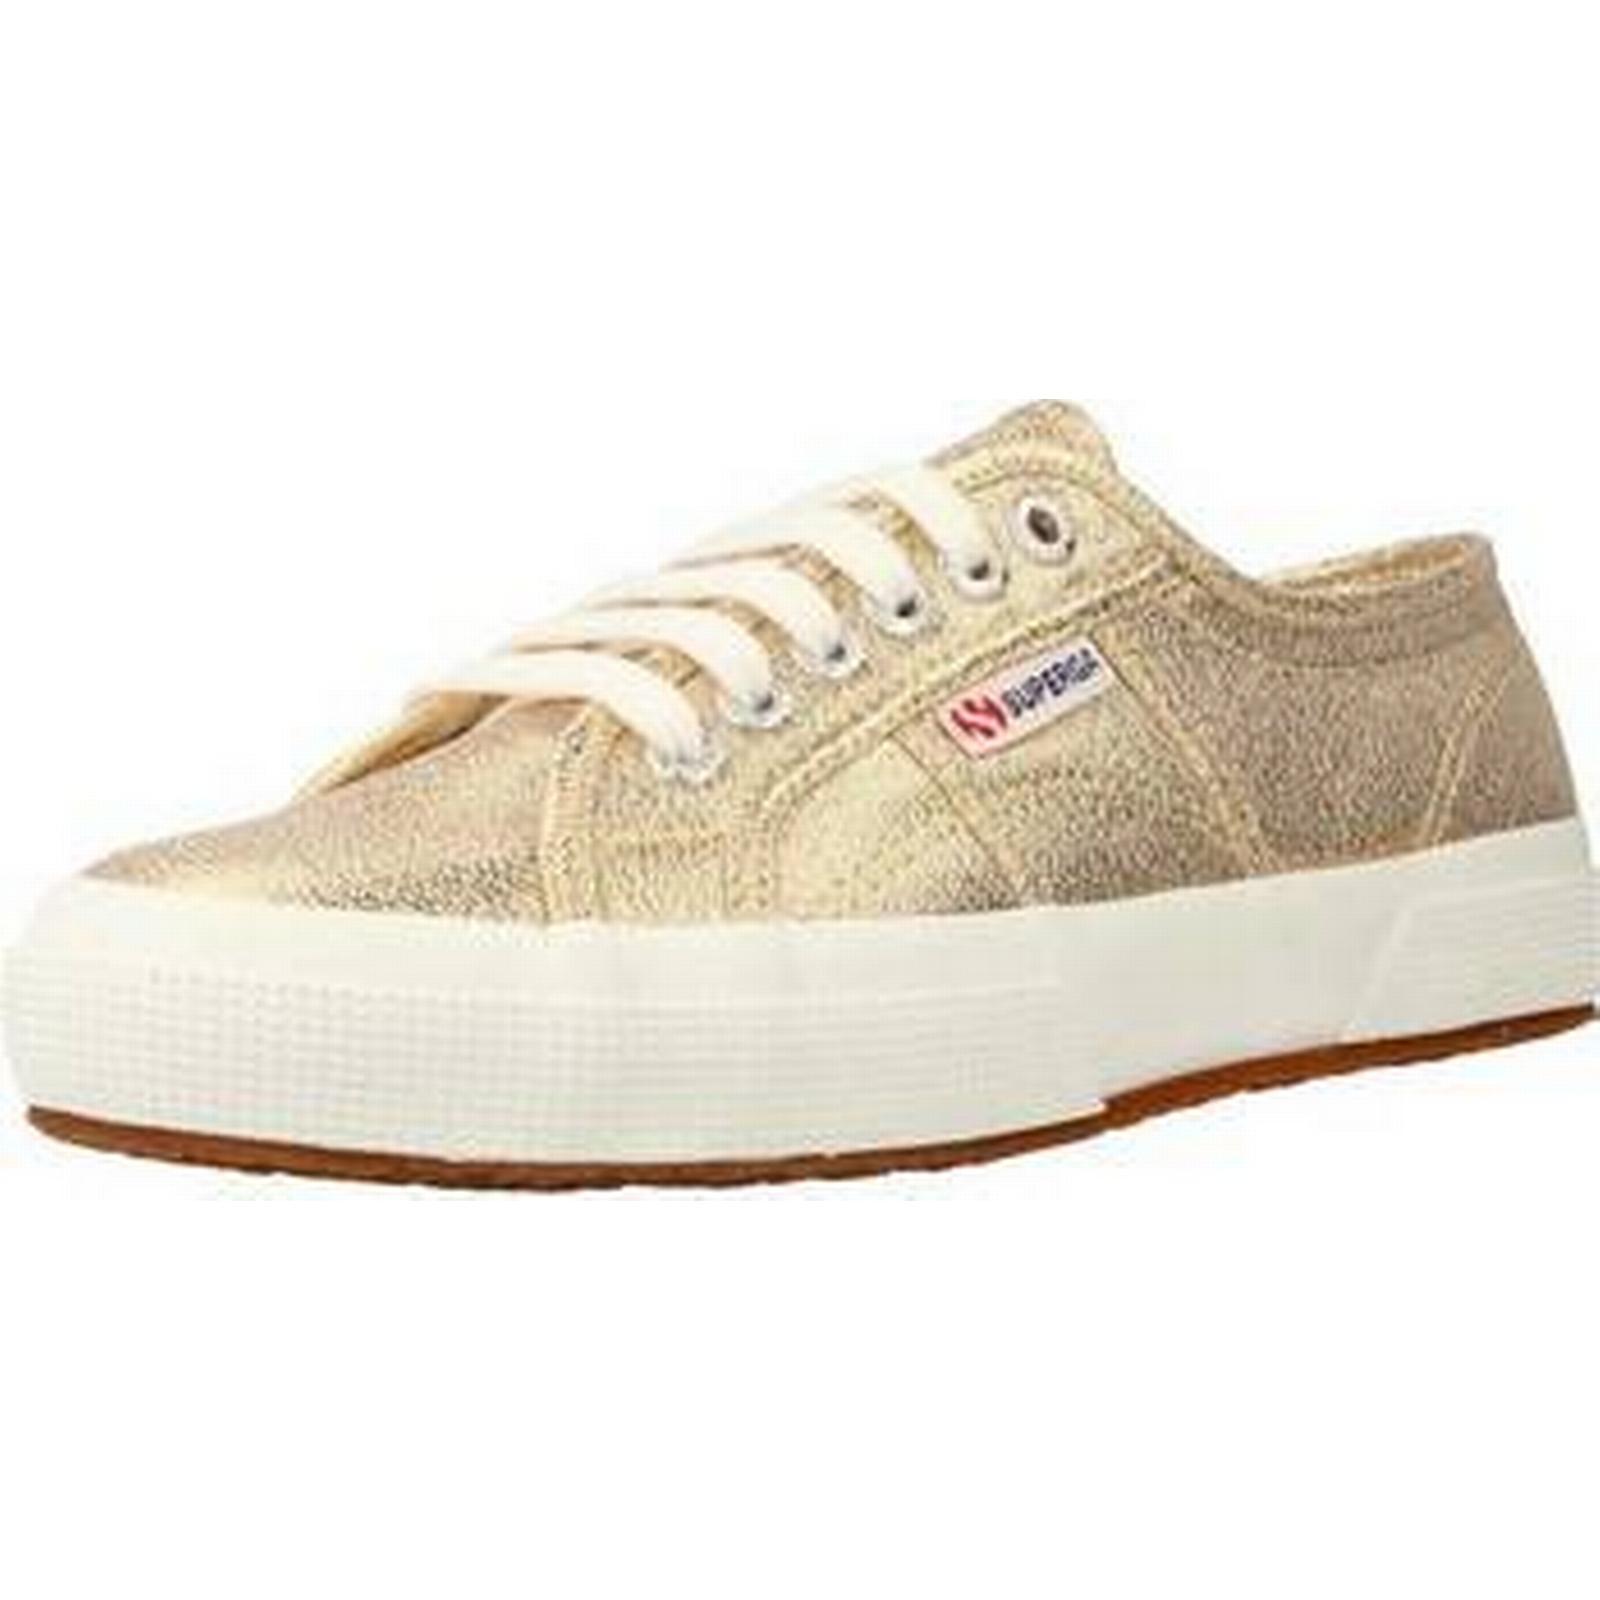 spartoo.co.uk superga  lamew femmes # & # femmes  ; s Chaussure s formateurs en or 96b6b3